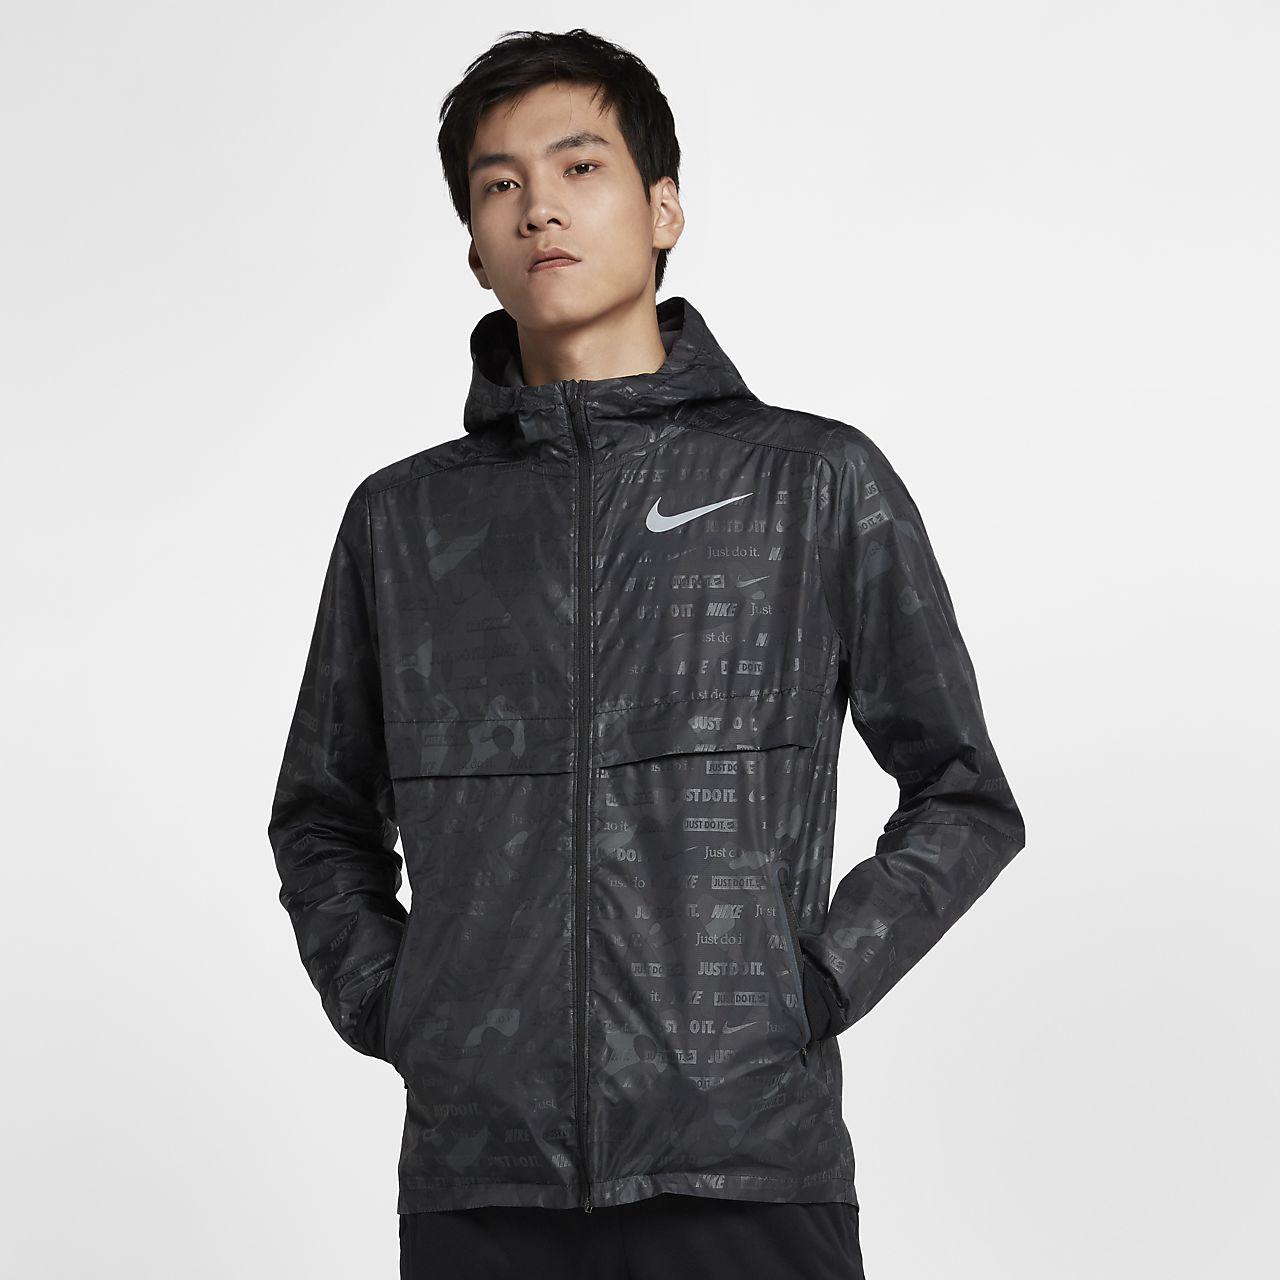 e89c3c323808 Nike Shield Ghost Flash Men s Running Jacket. Nike.com CA